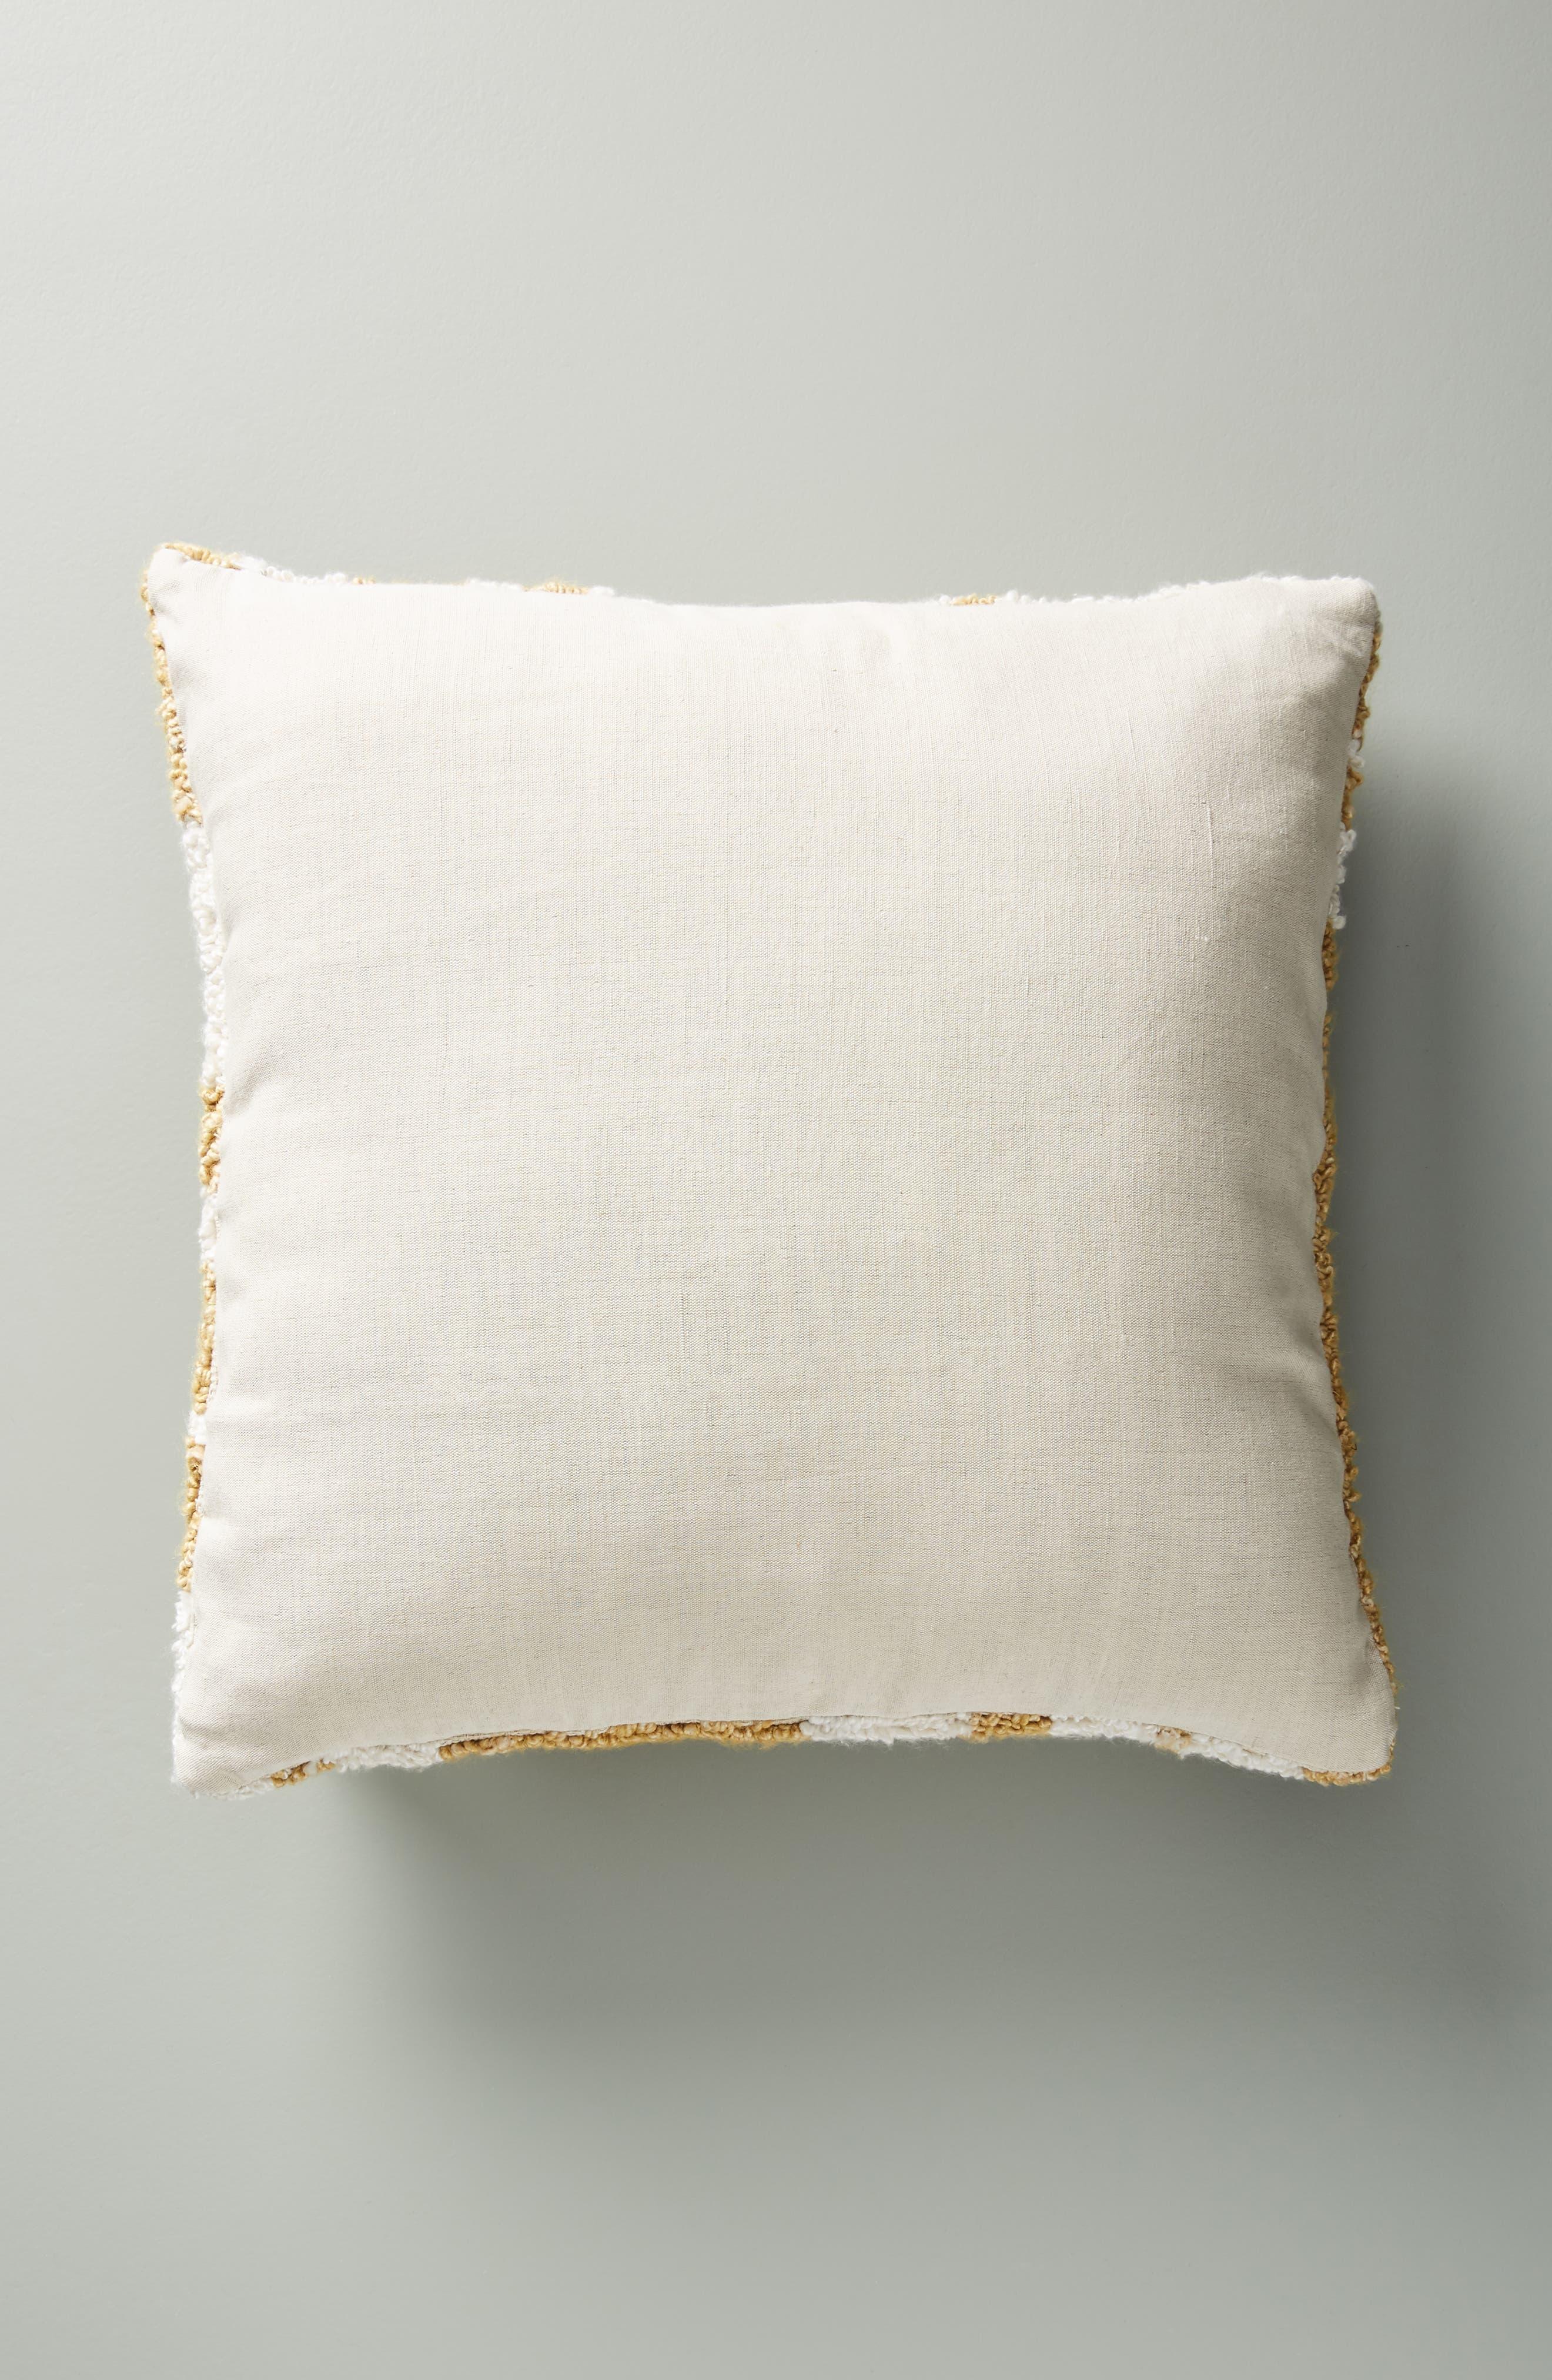 ANTHROPOLOGIE,                             Jordana Accent Pillow,                             Alternate thumbnail 2, color,                             OCHRE